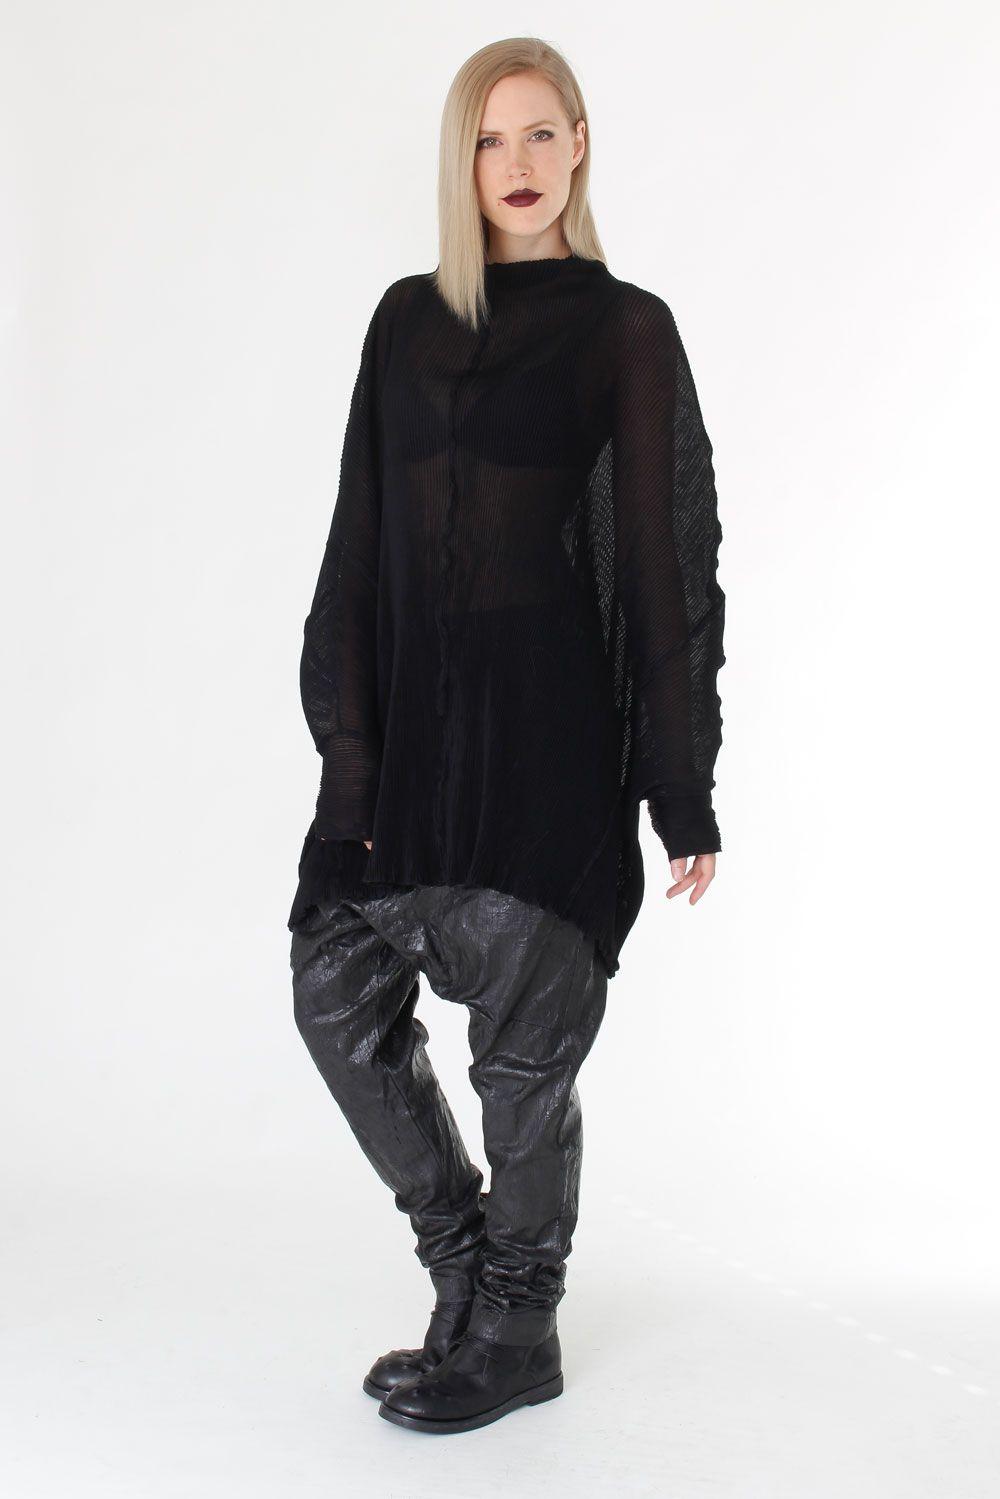 Nelly Johansson elegant shirt dorian #dorian #shirt #longsleeve #nellyjohansson #nelly #selectmodeonline #winter #fashion